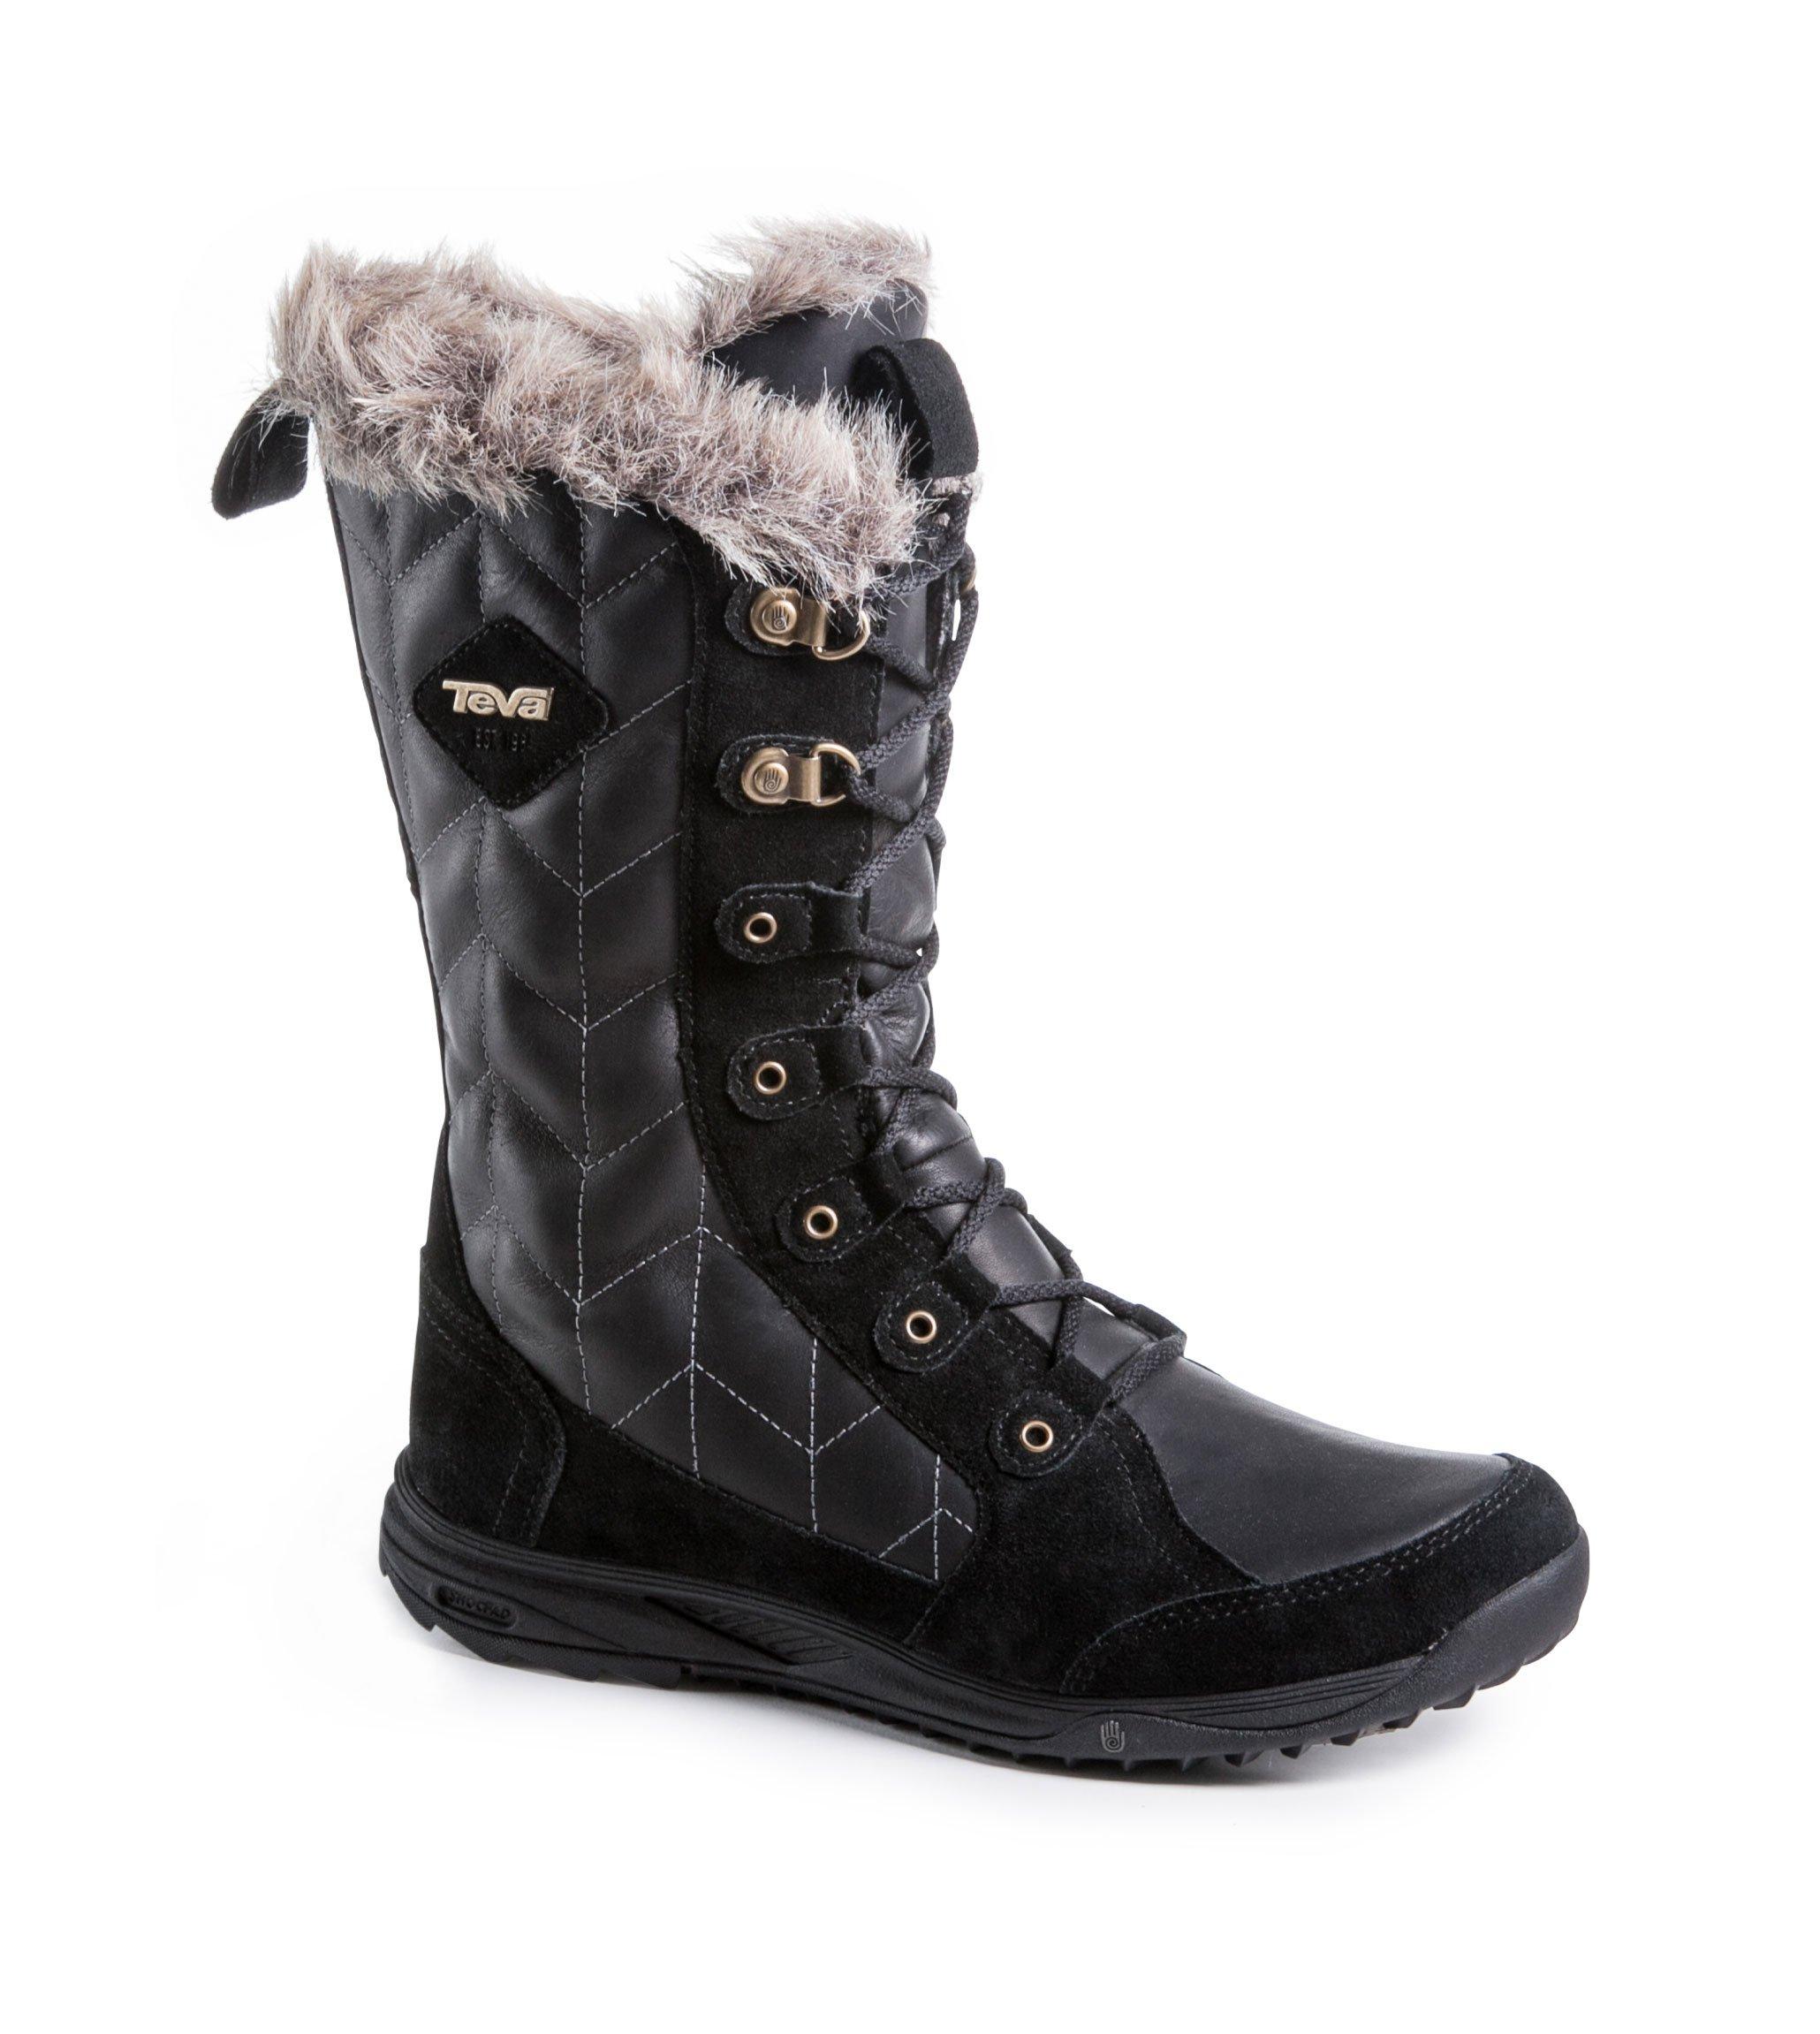 Teva Teva lenawee leather damestøvle fra billigsport24